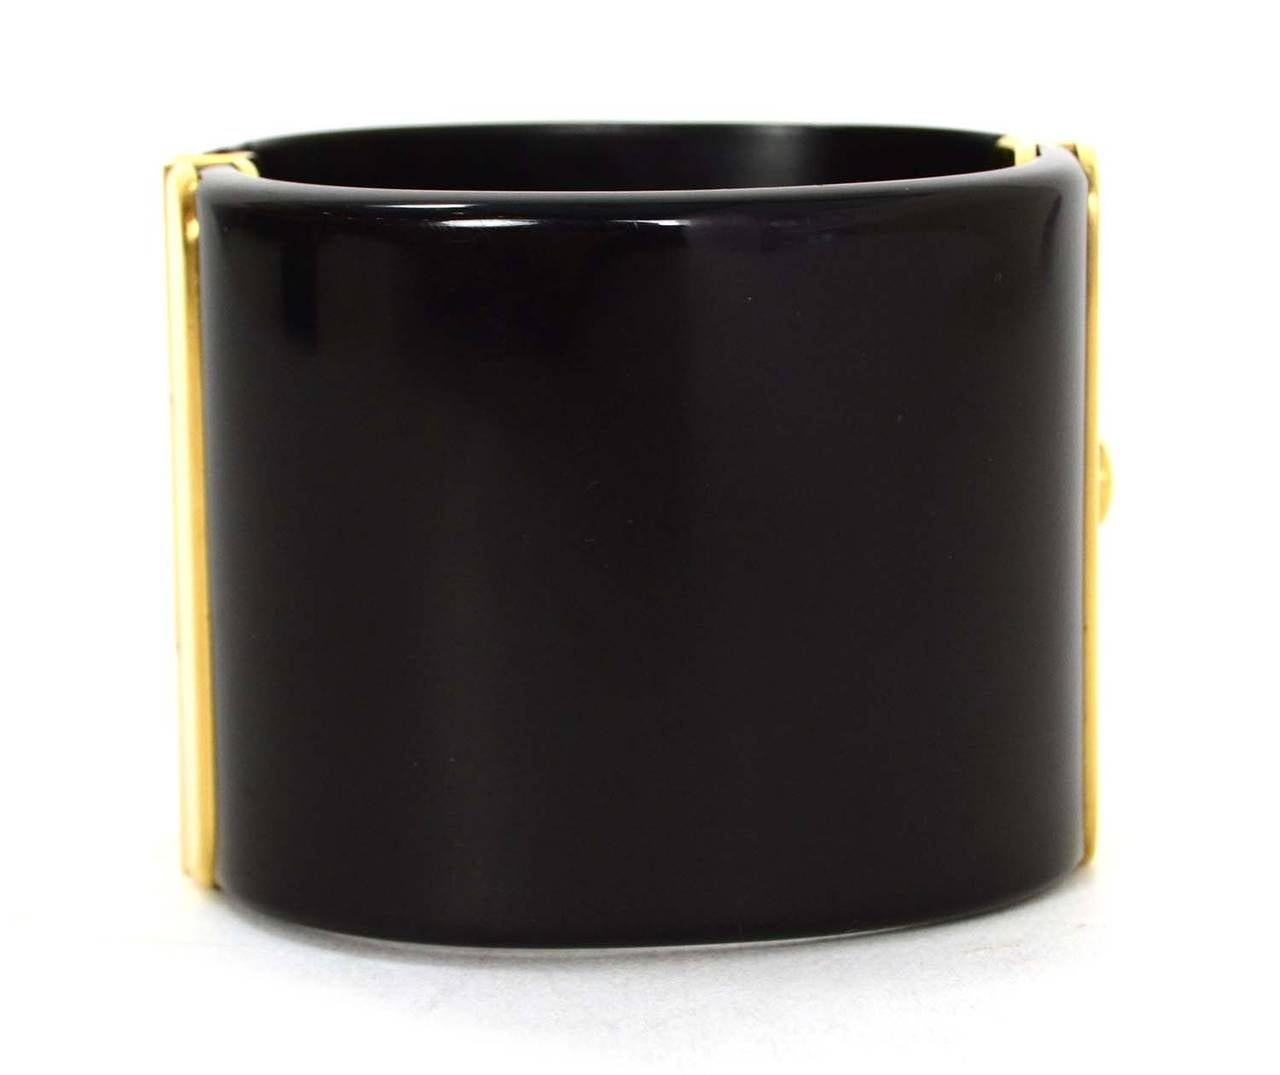 CHANEL Black Resin & Goldtone Cuff Bracelet 3